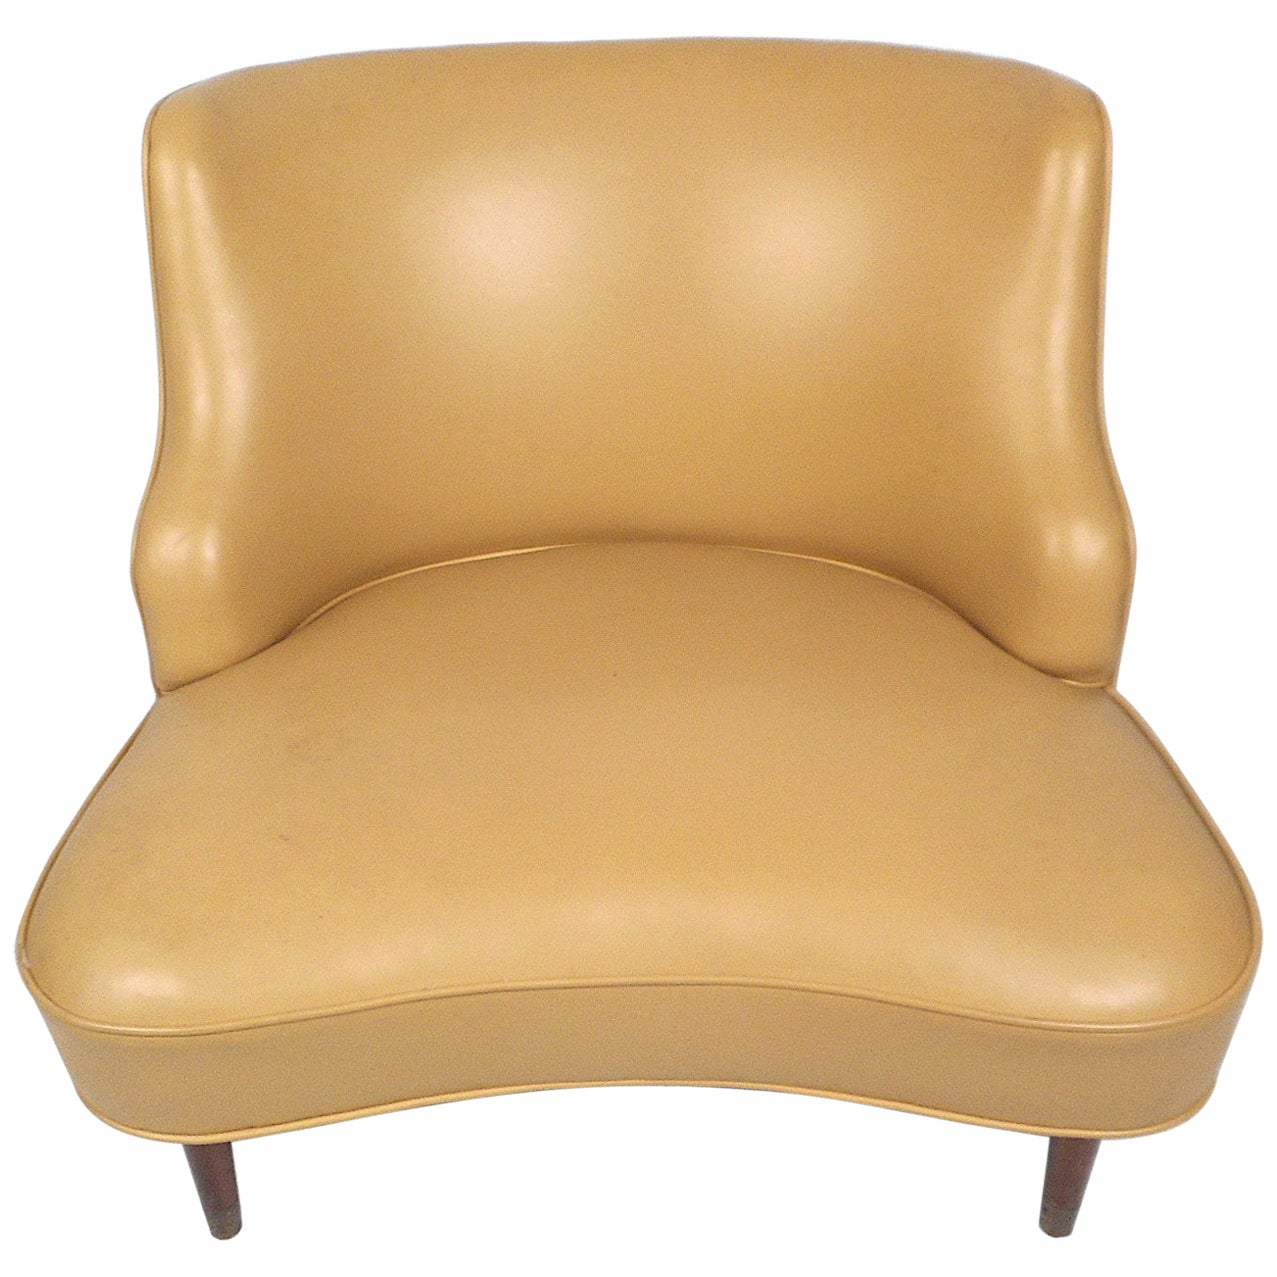 Mid-Century Modern Vinyl Lounge Chair